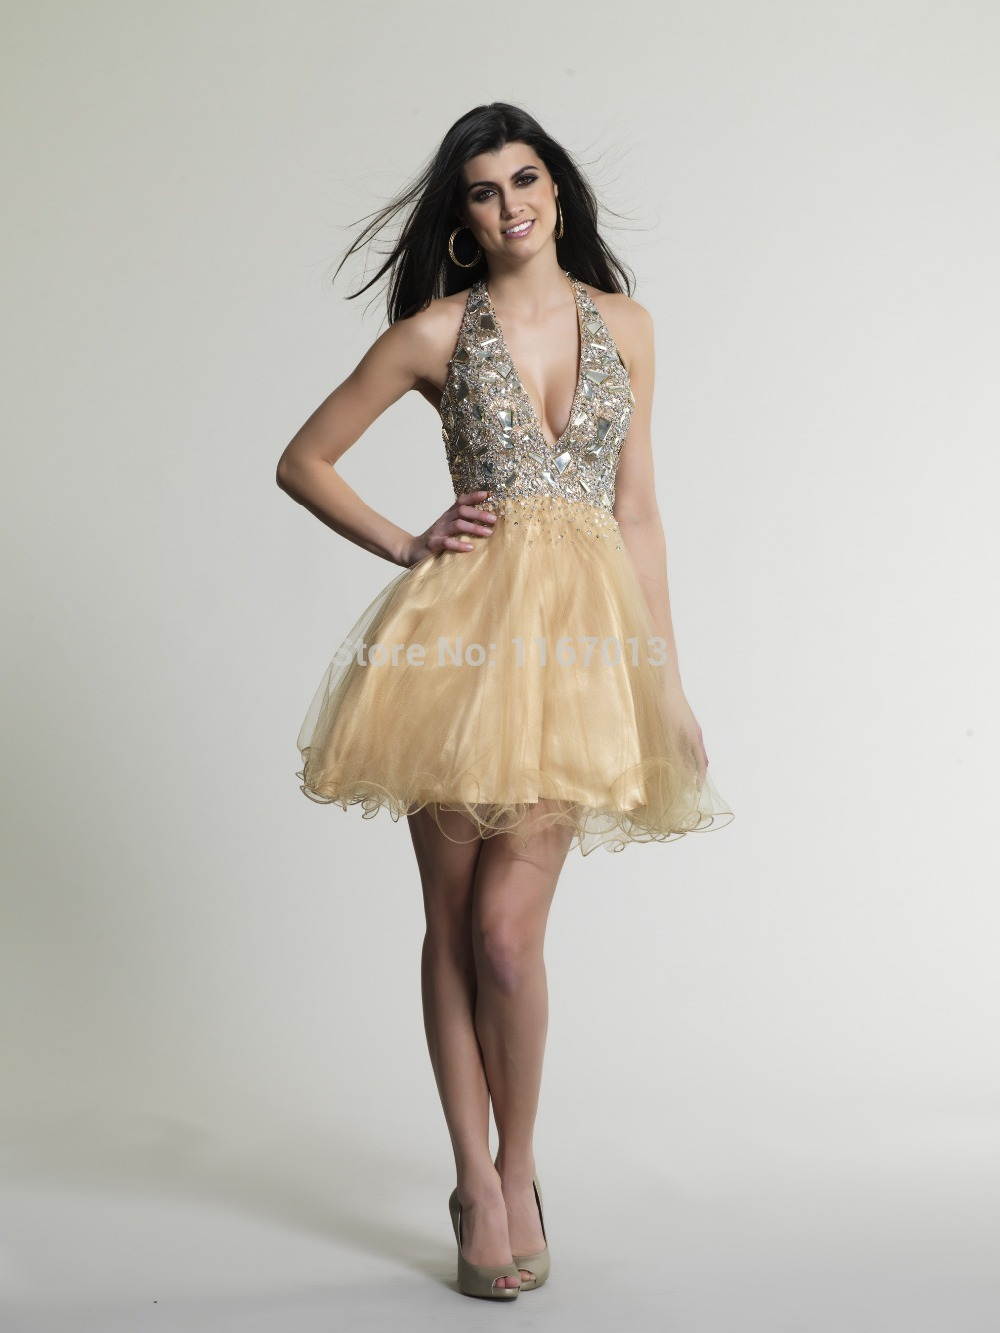 Aliexpress.com : Buy Cocktail Dresses For Tall Women Evening Dress ...